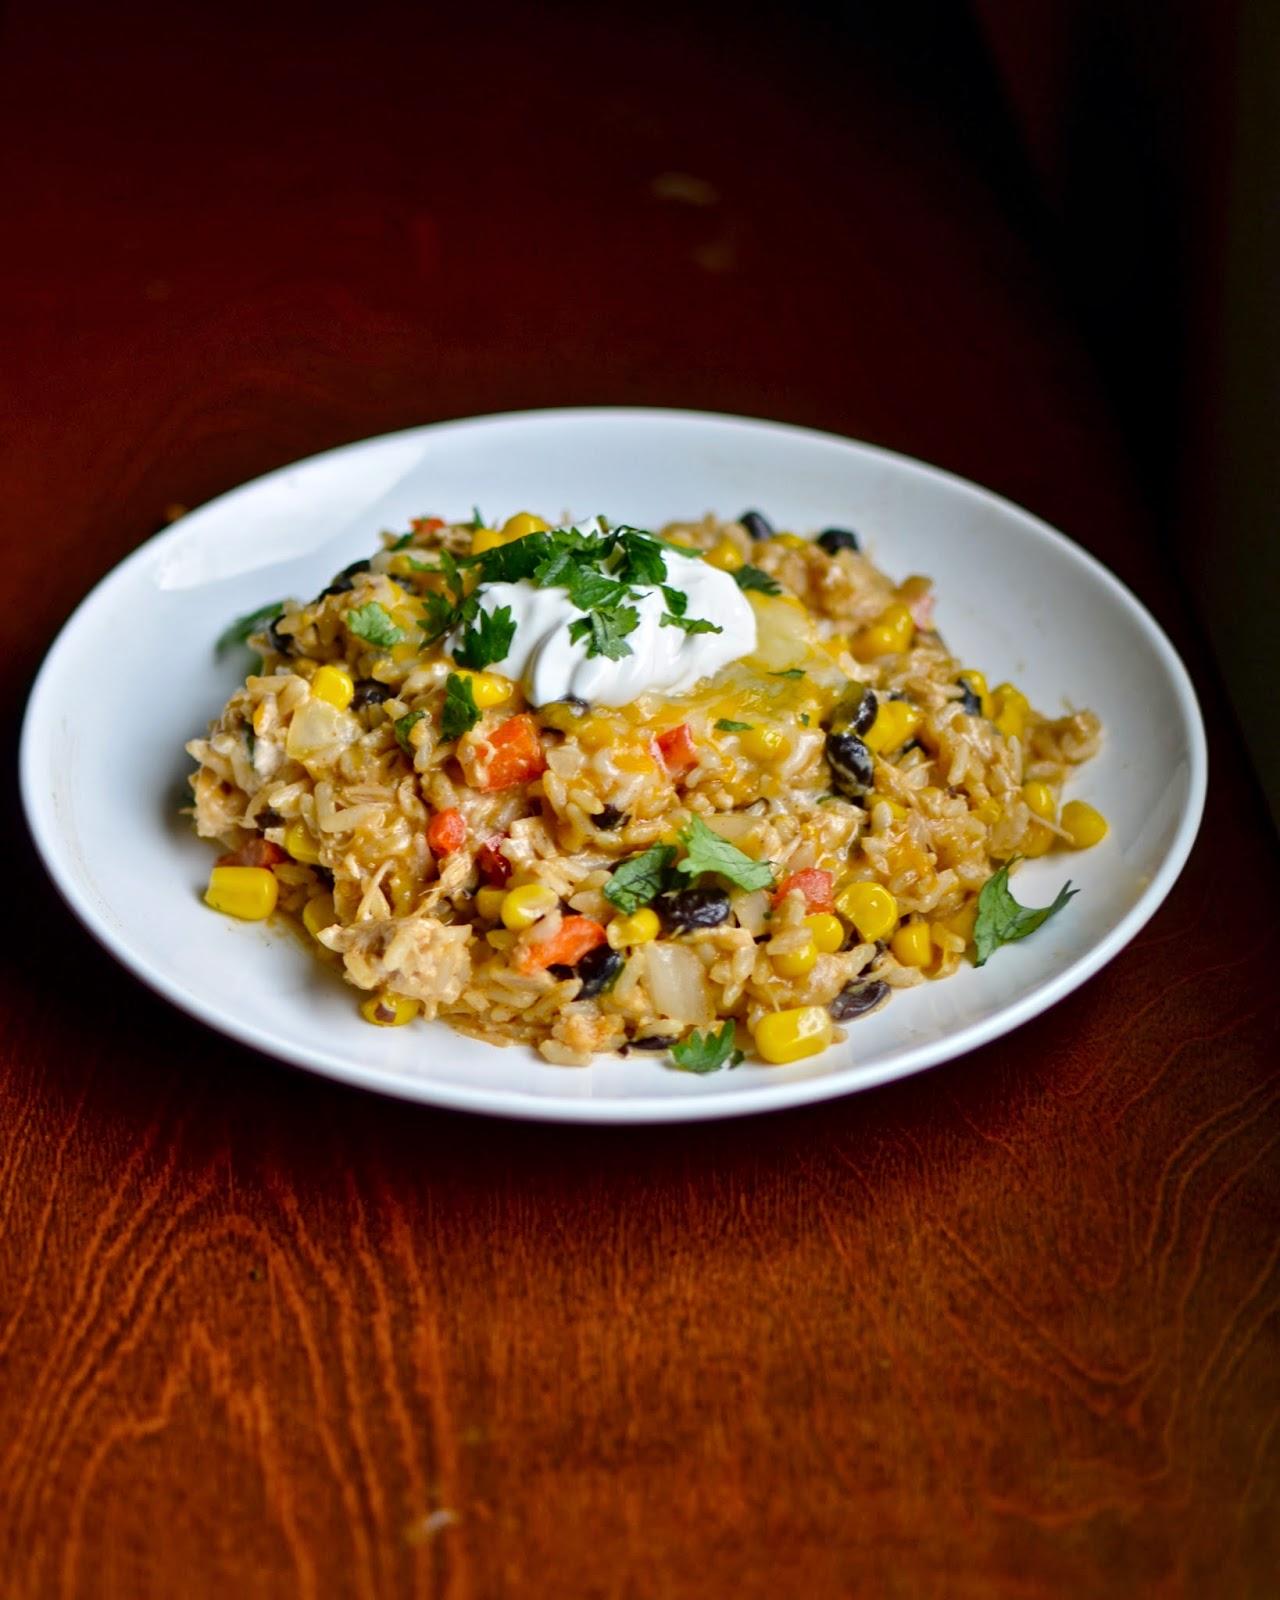 Yammie's Glutenfreedom: Chipotle Chicken and Rice